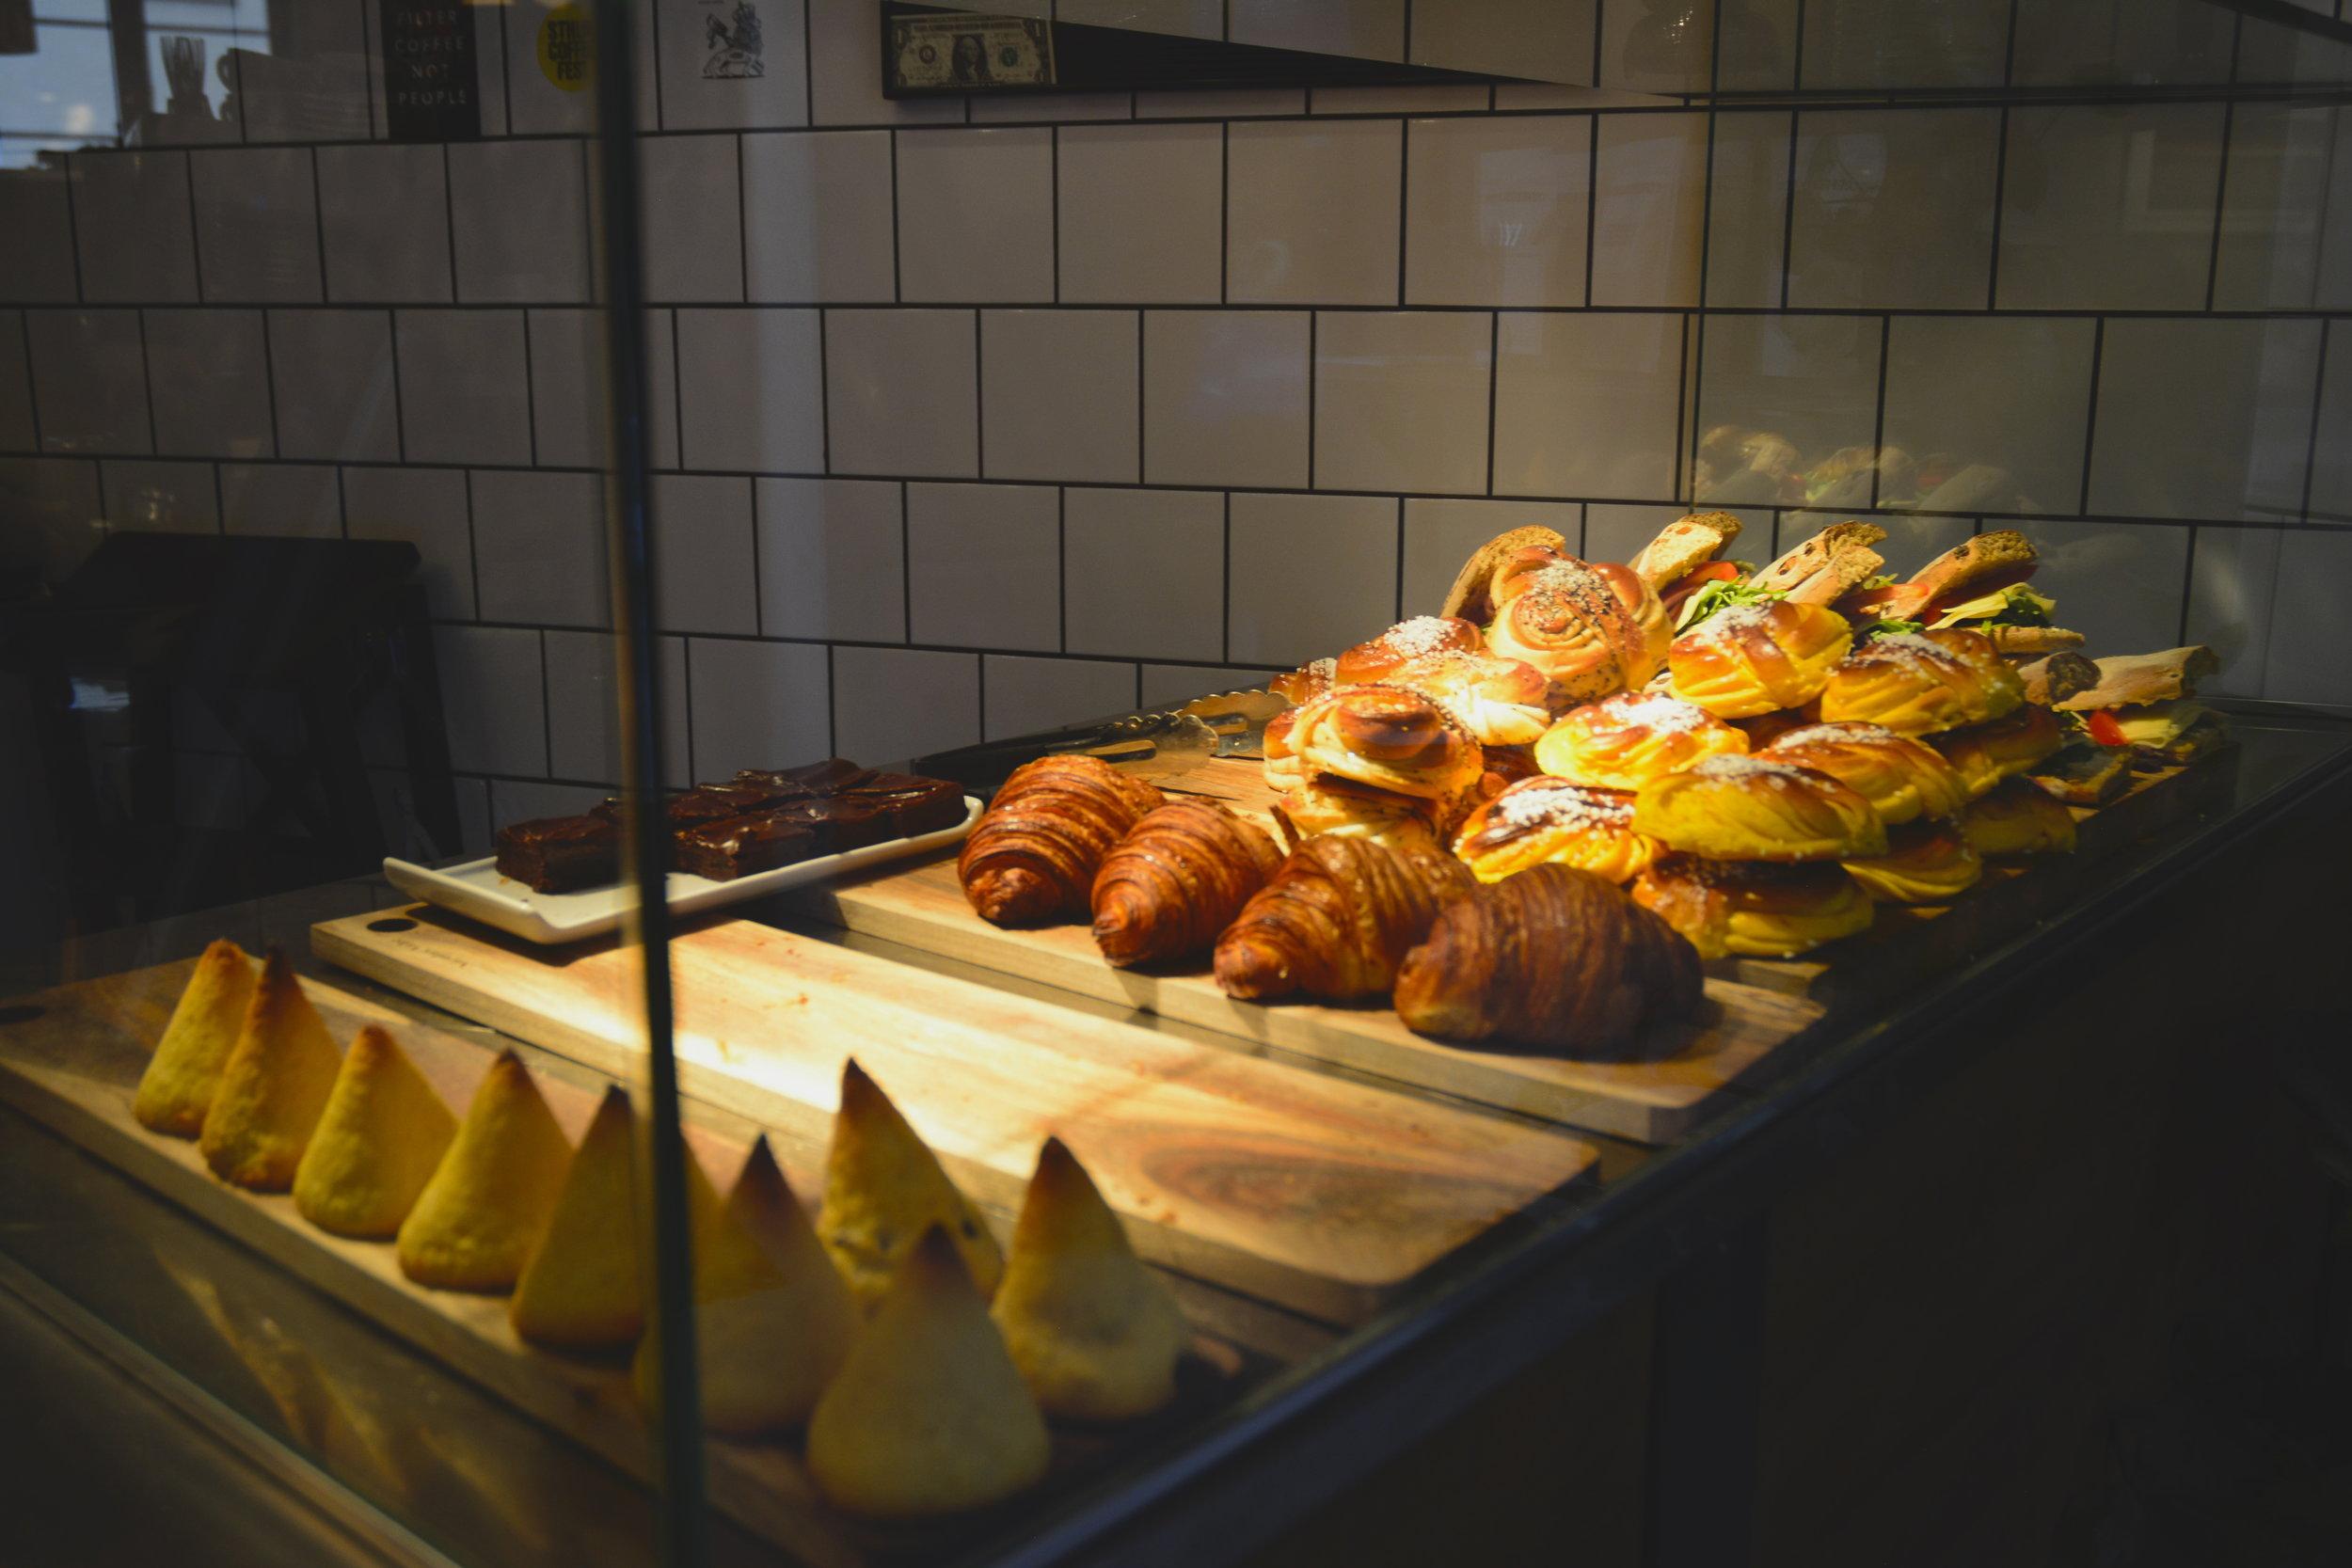 Swedish pastries like the Kanelbullar (cardamom bun) is a Swedish mainstay during fika